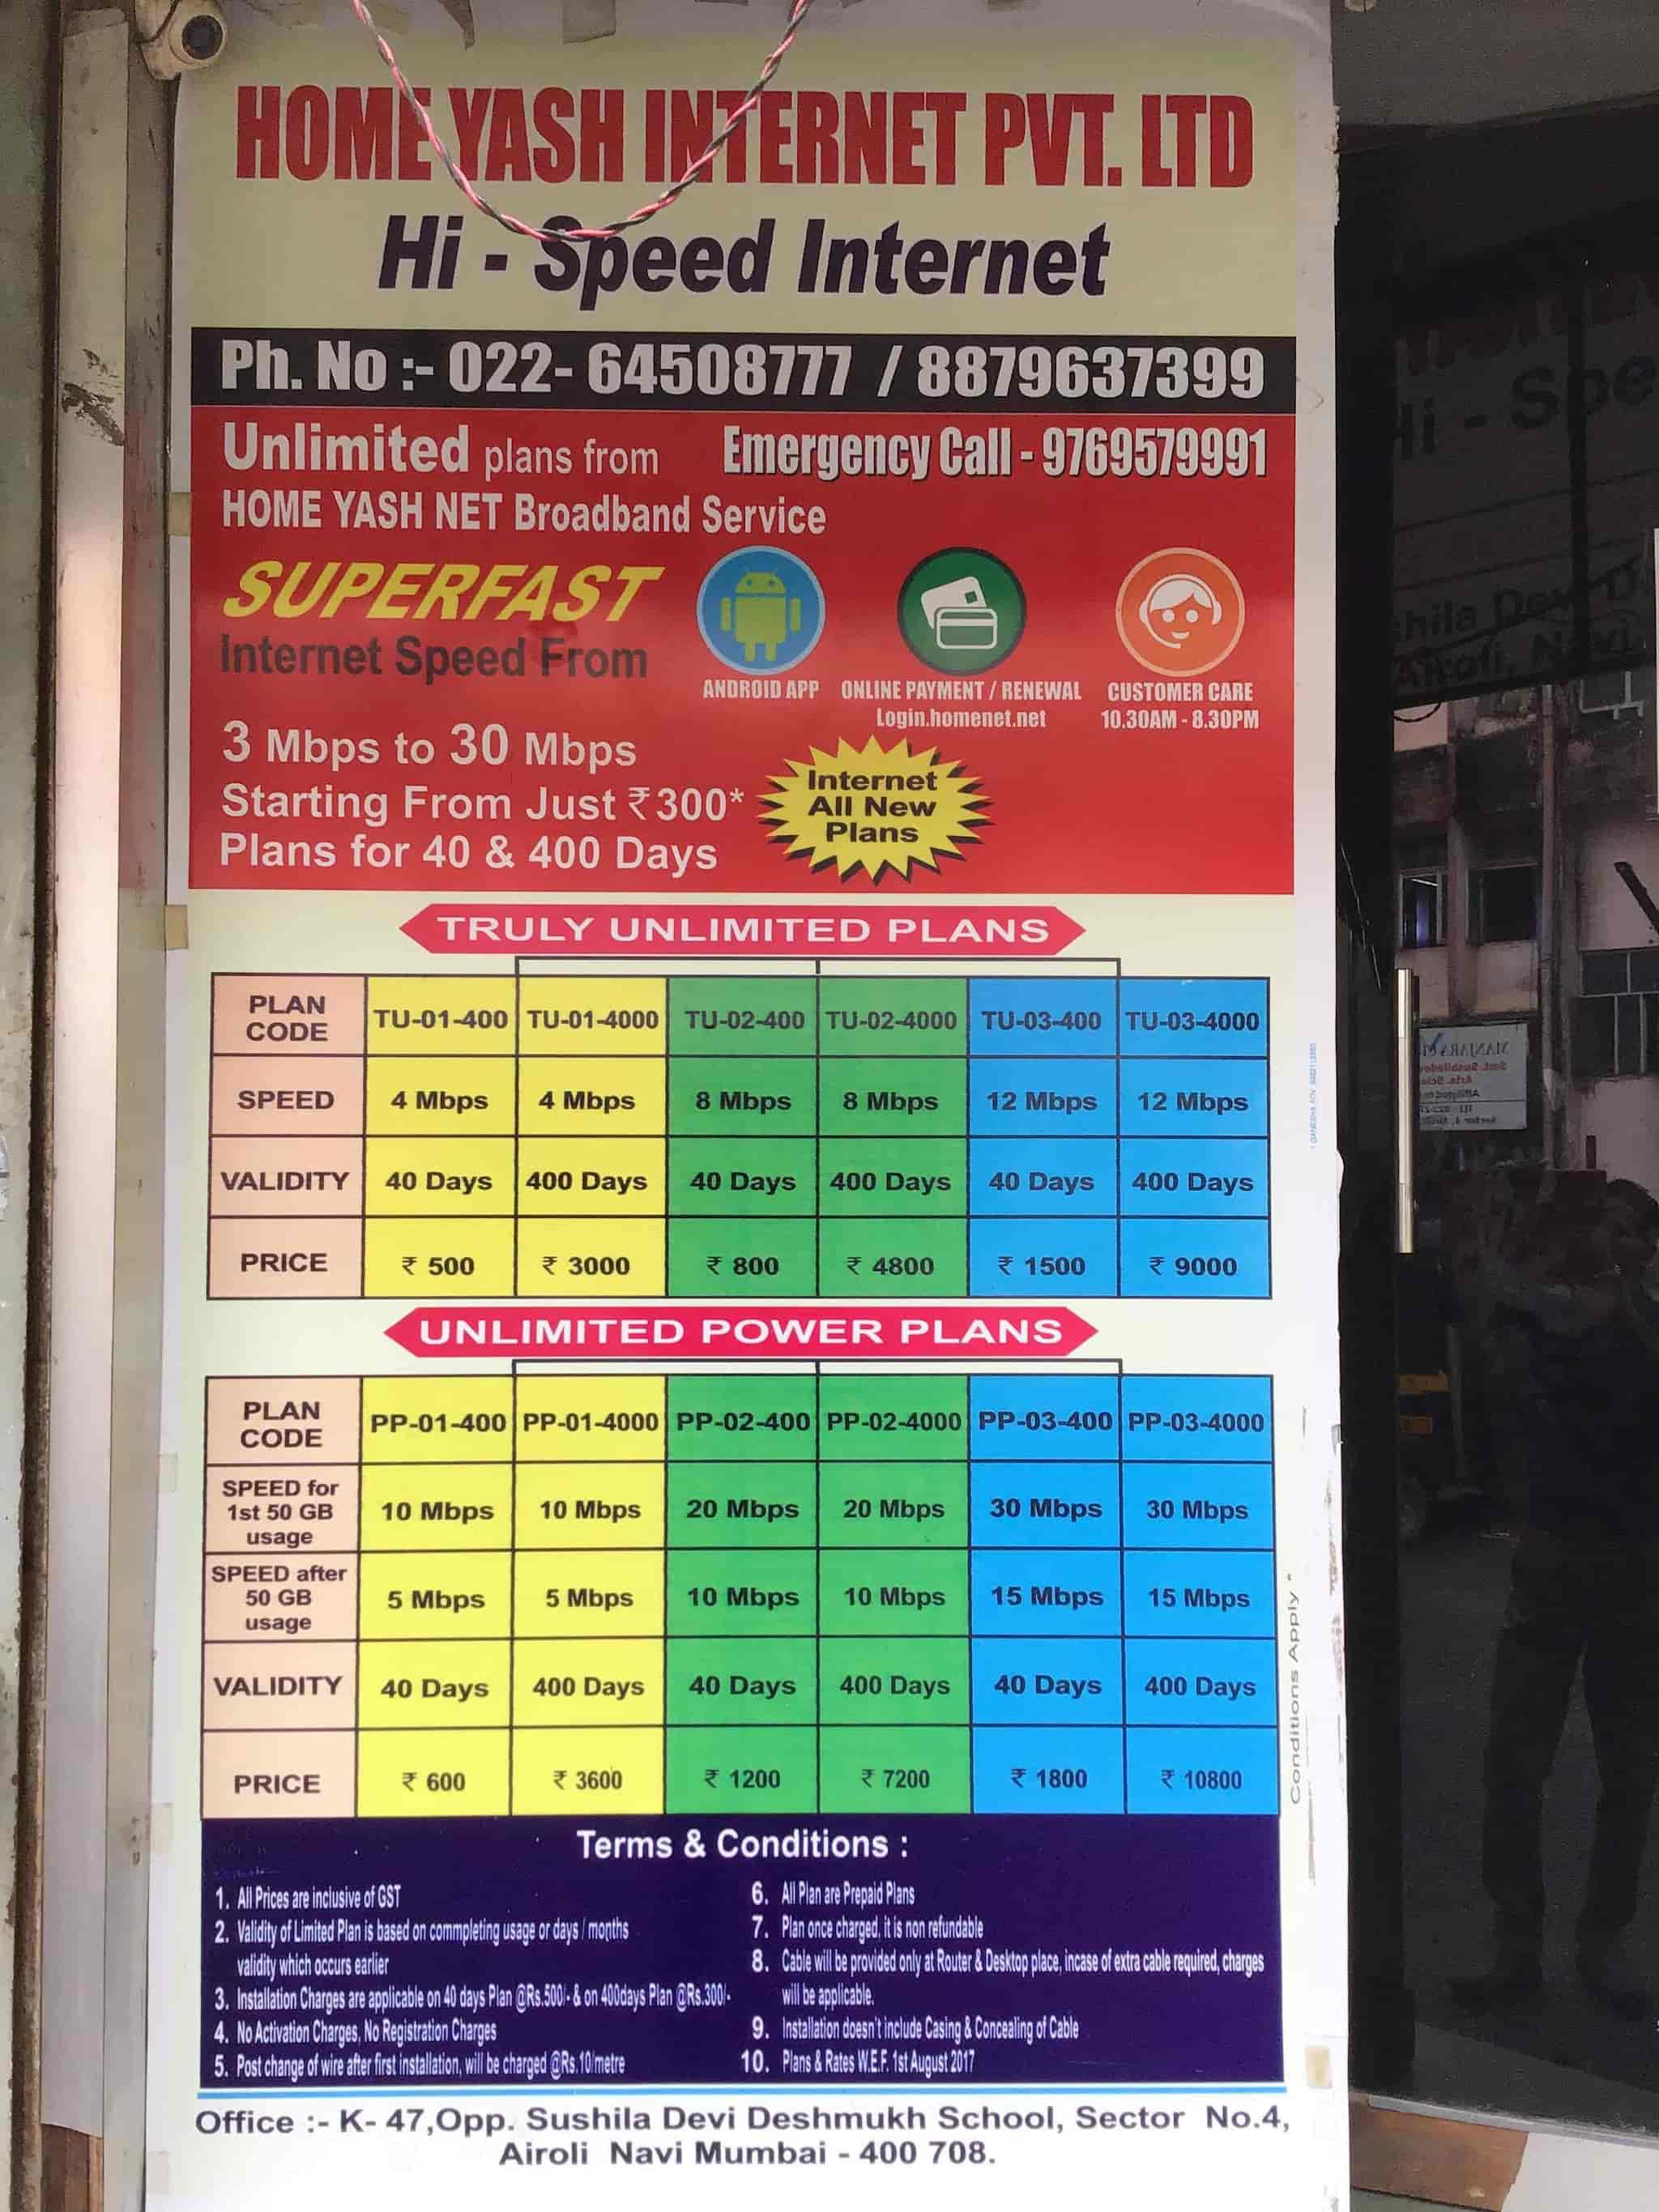 Home Yash Internet Pvt Ltd, Airoli Sector 4 - Internet